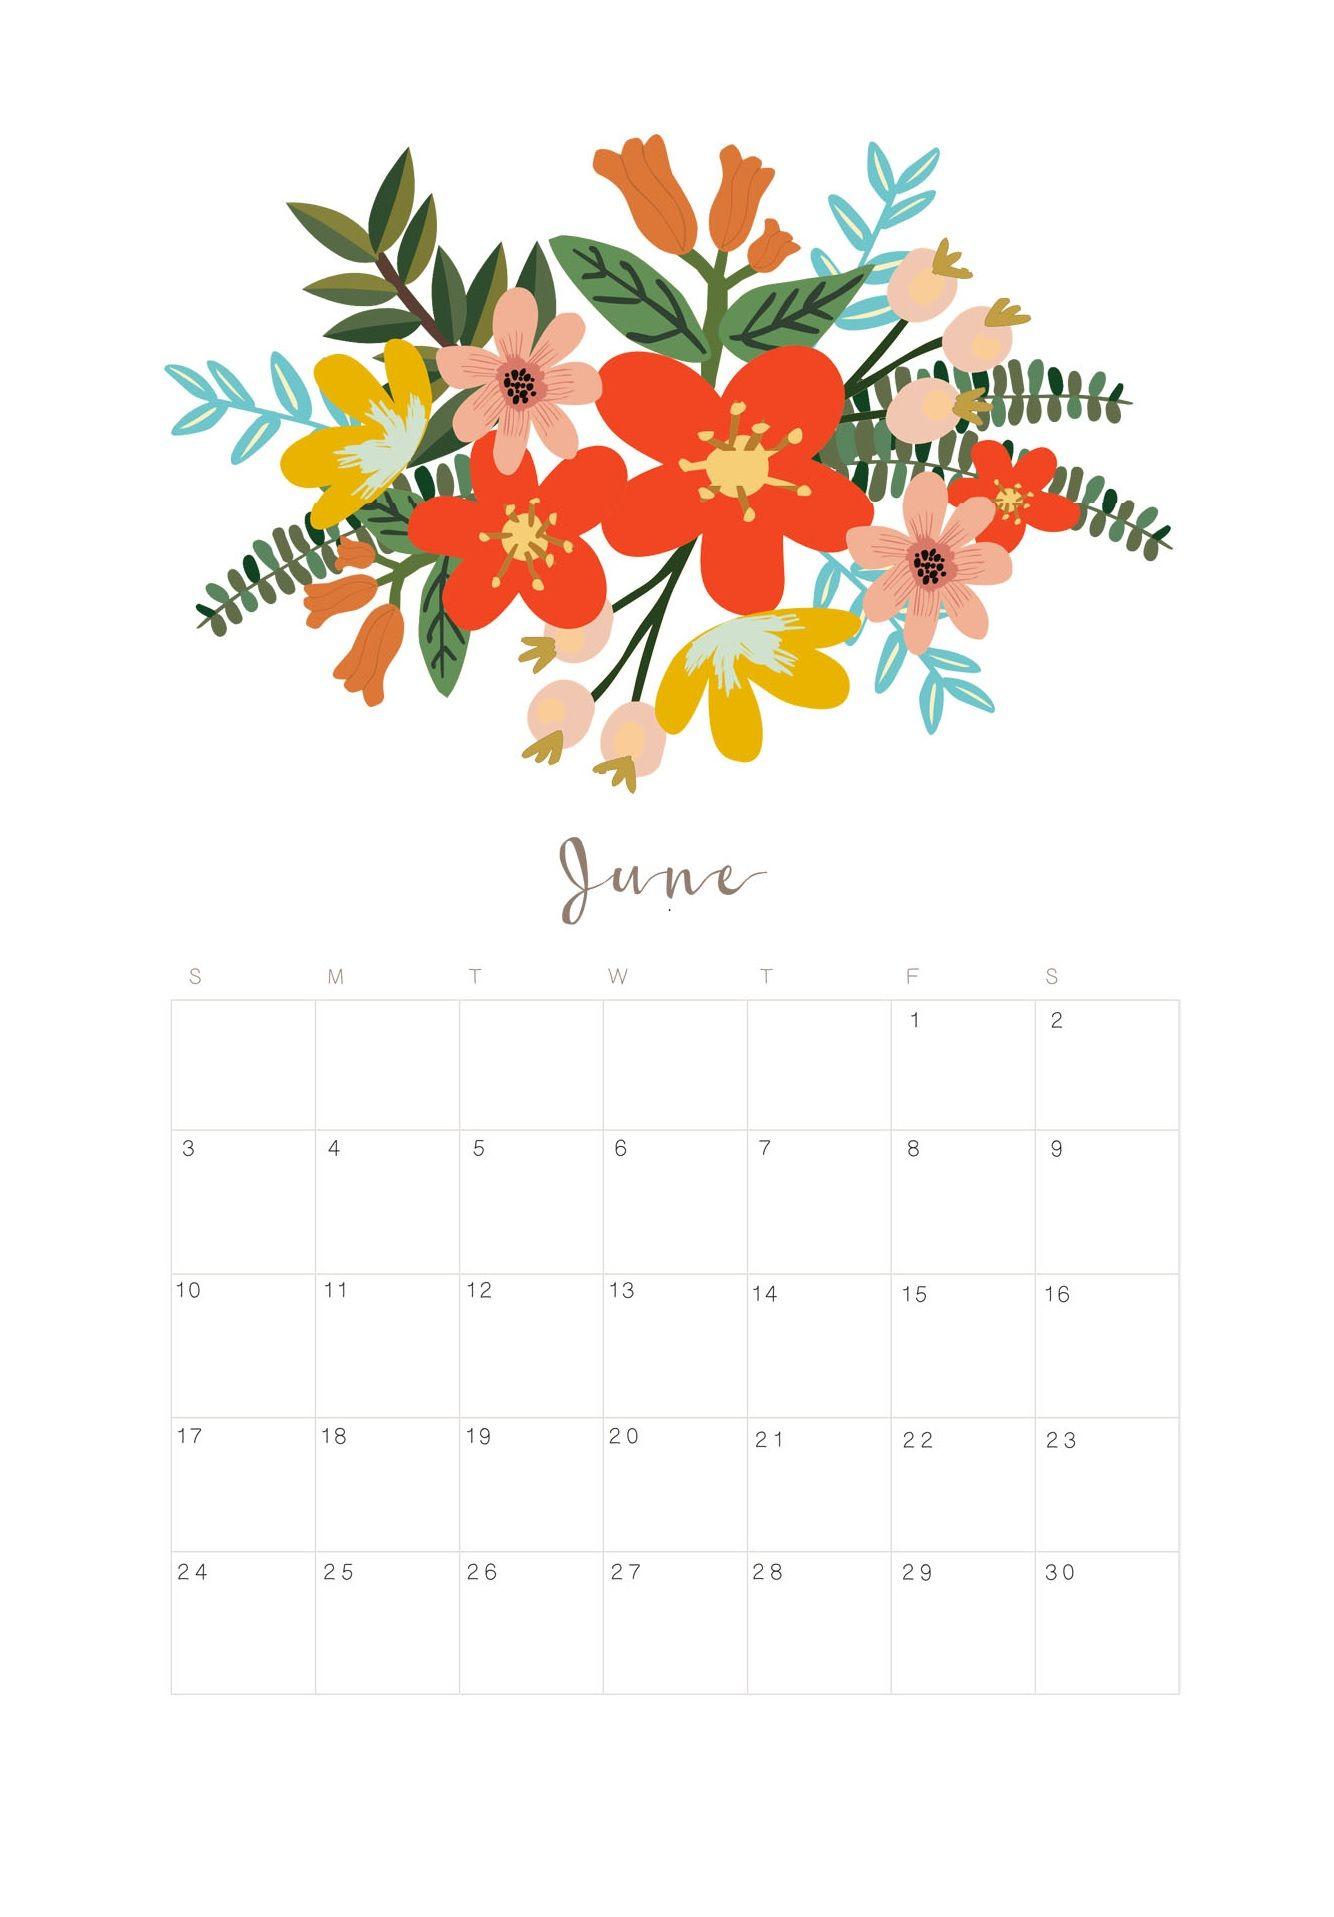 June 2018 Wall Calendar